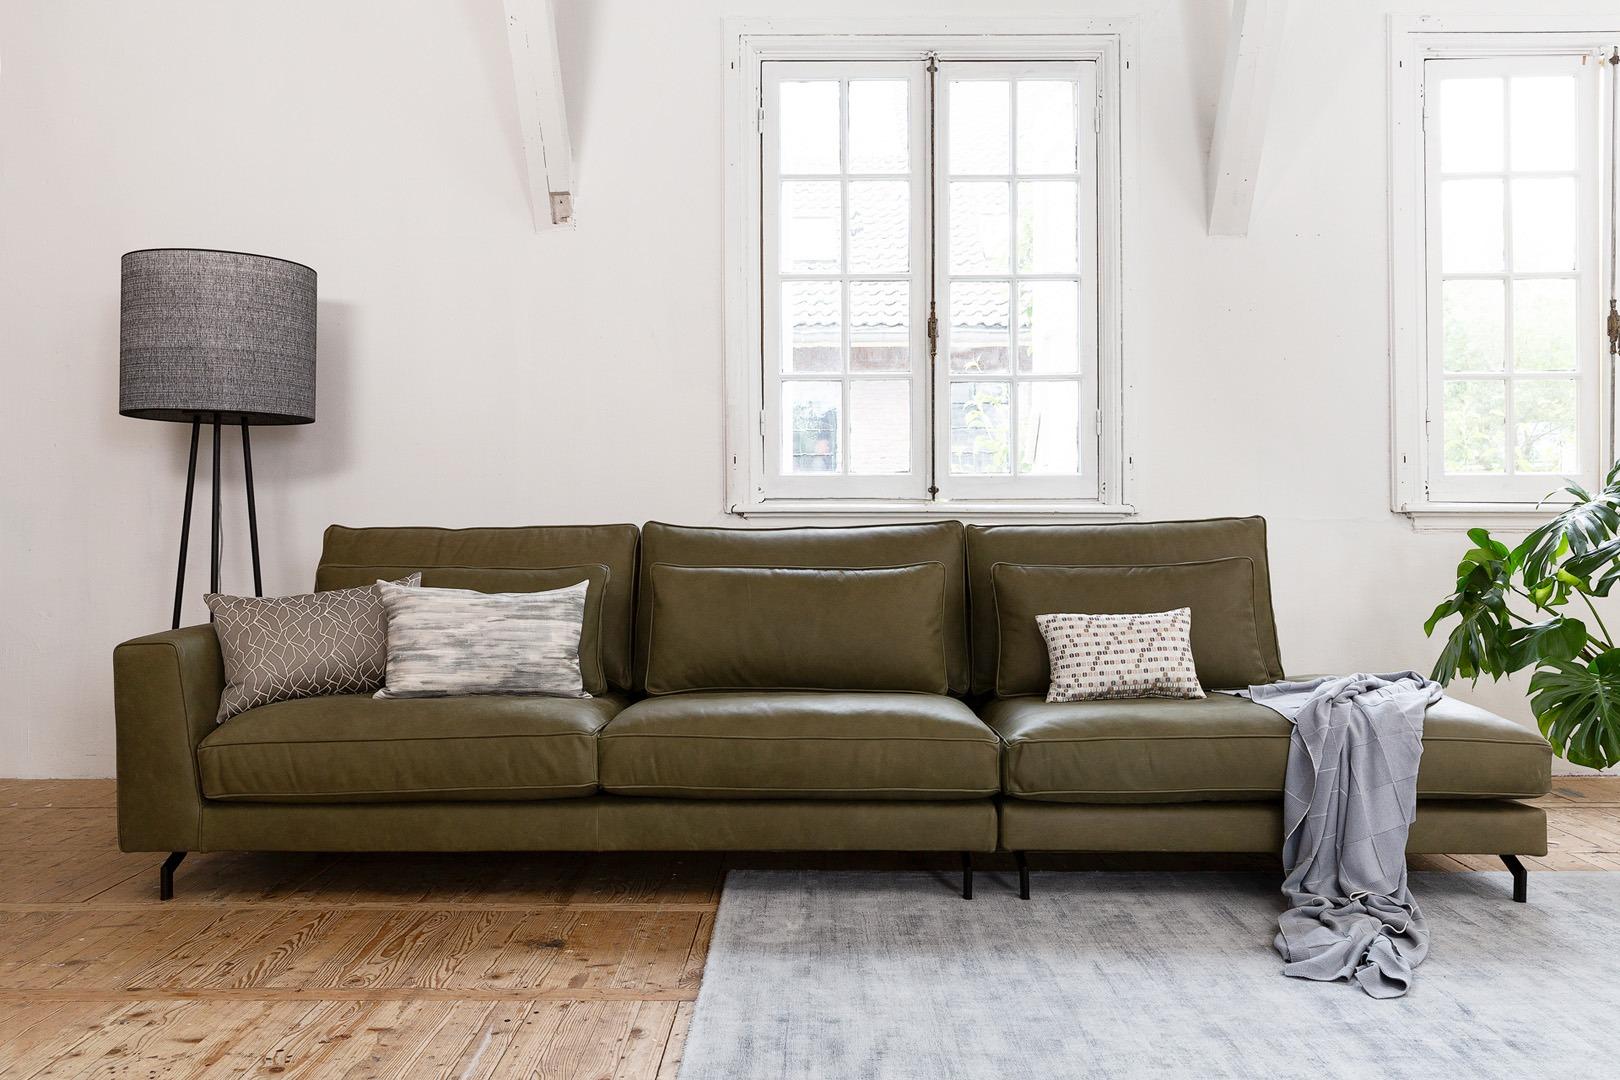 sweet-portobello-leer-groen-ottoman-terminal-soofs-interieur (1)